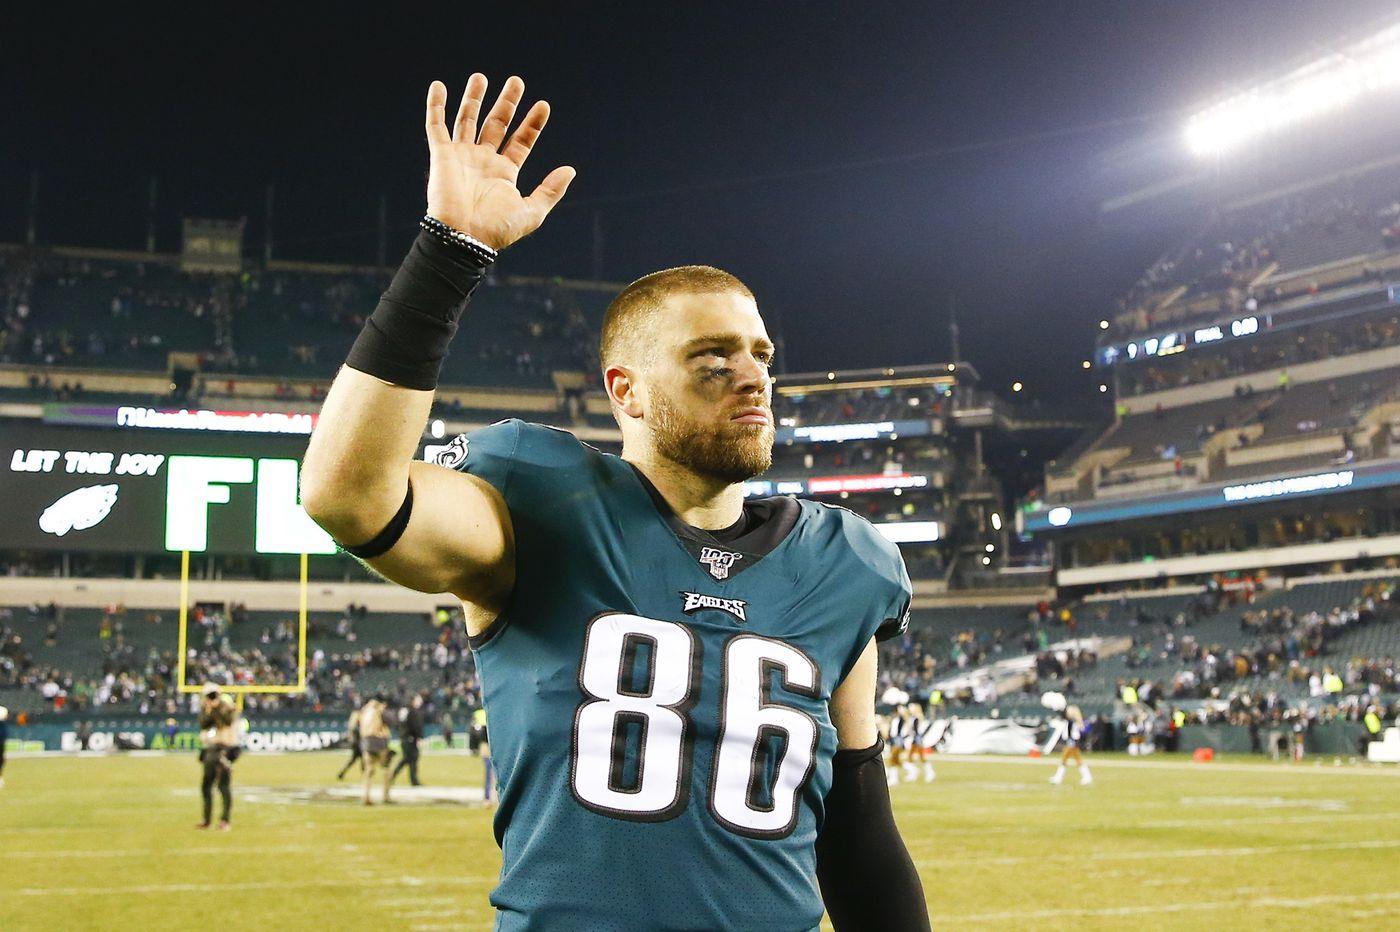 Eagles' Zach Ertz urges Pennsylvania high schools not to cancel 2020 fall sports